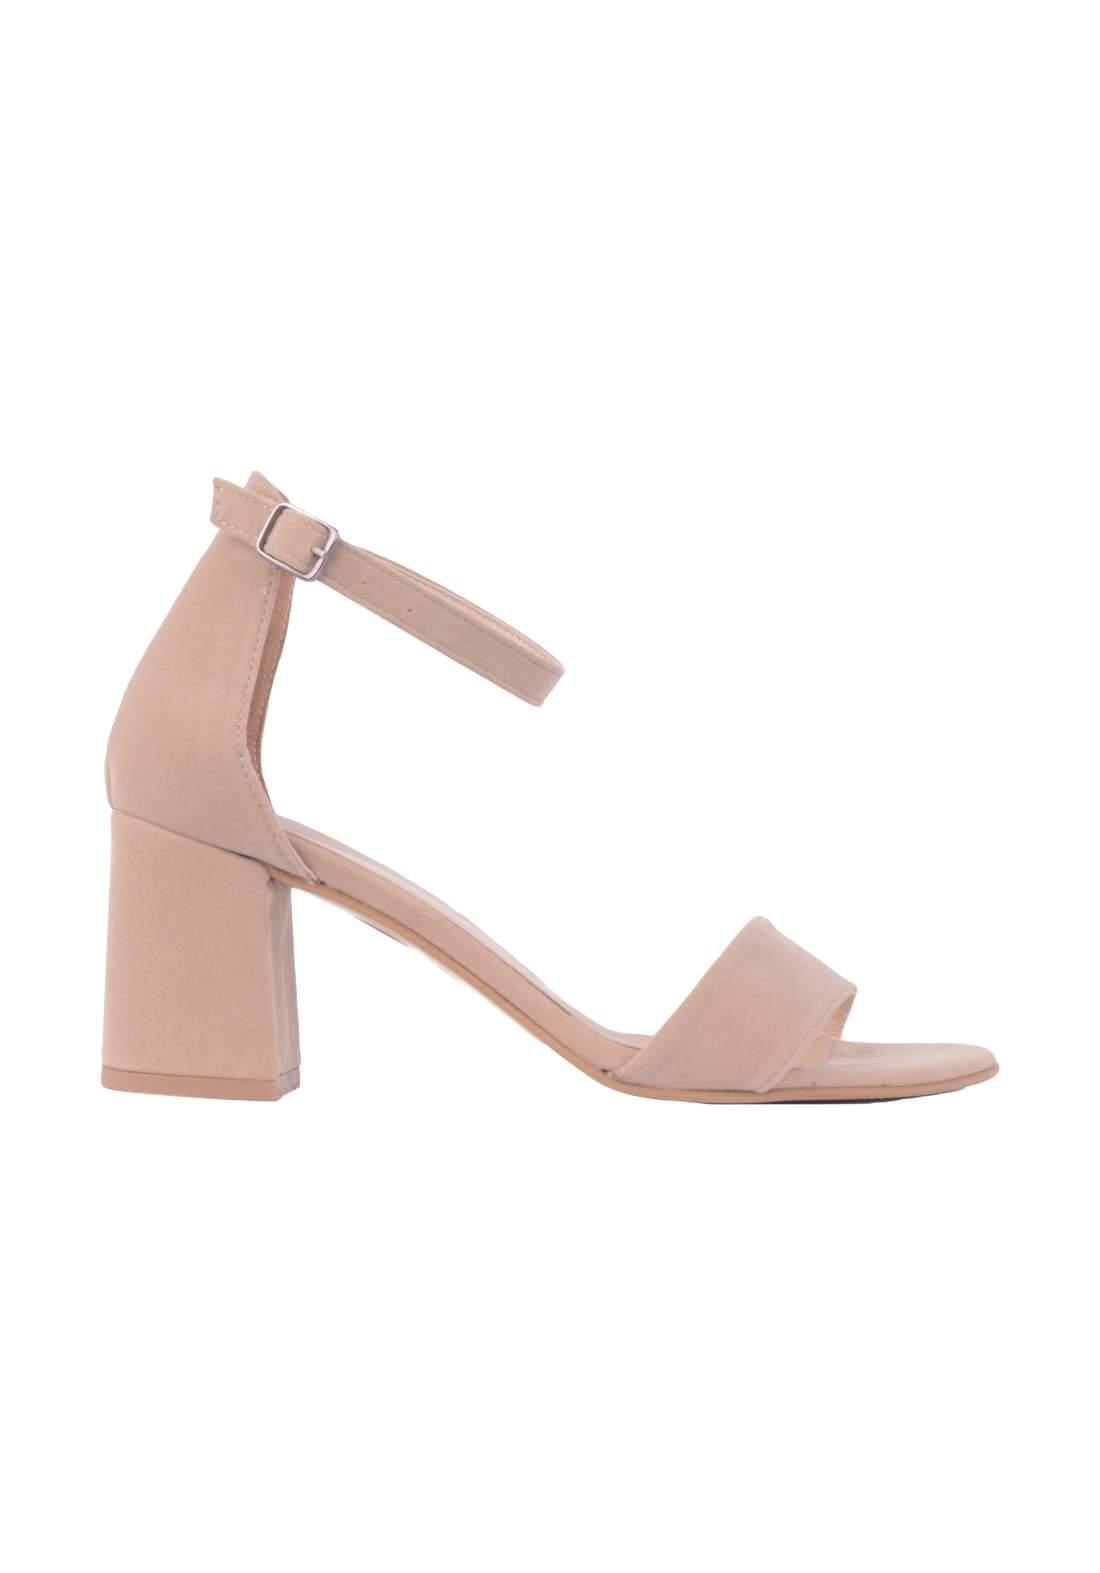 حذاء كعب نسائي وردي اللون